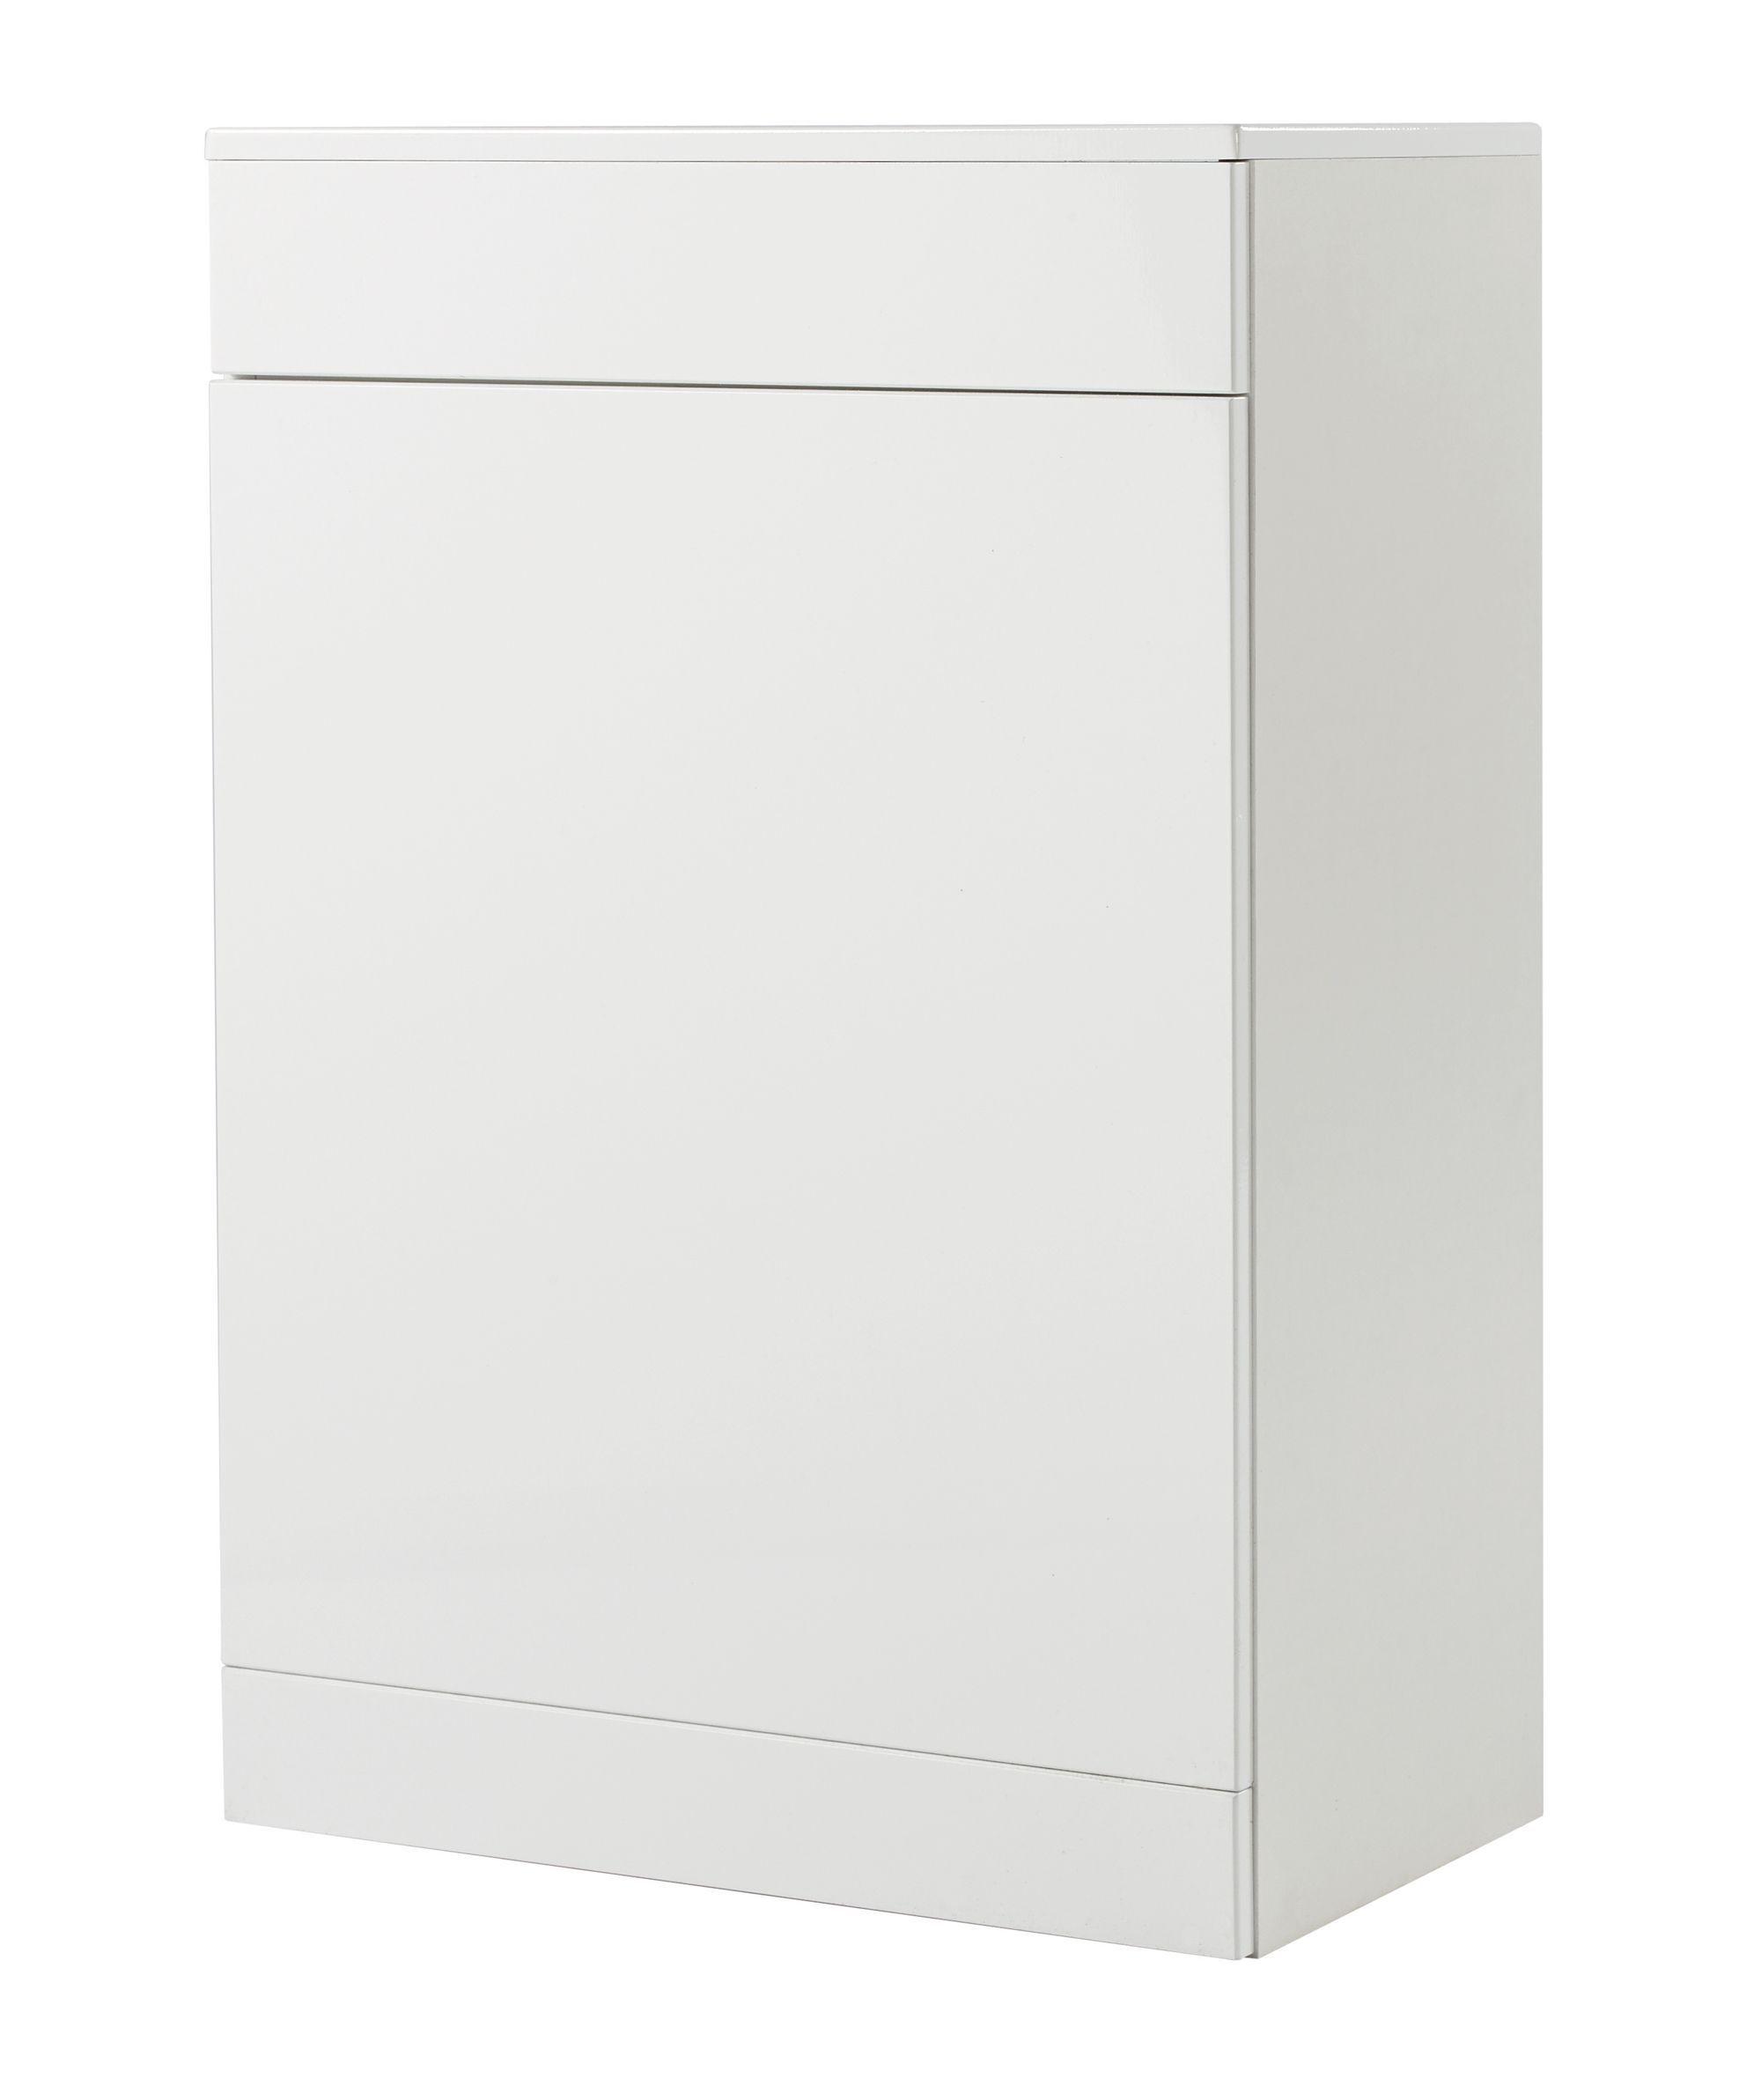 Gloss White Toilet Bathroom Cabinet Unit Waterproof Pvc Pressed Round Door Edges Ebay